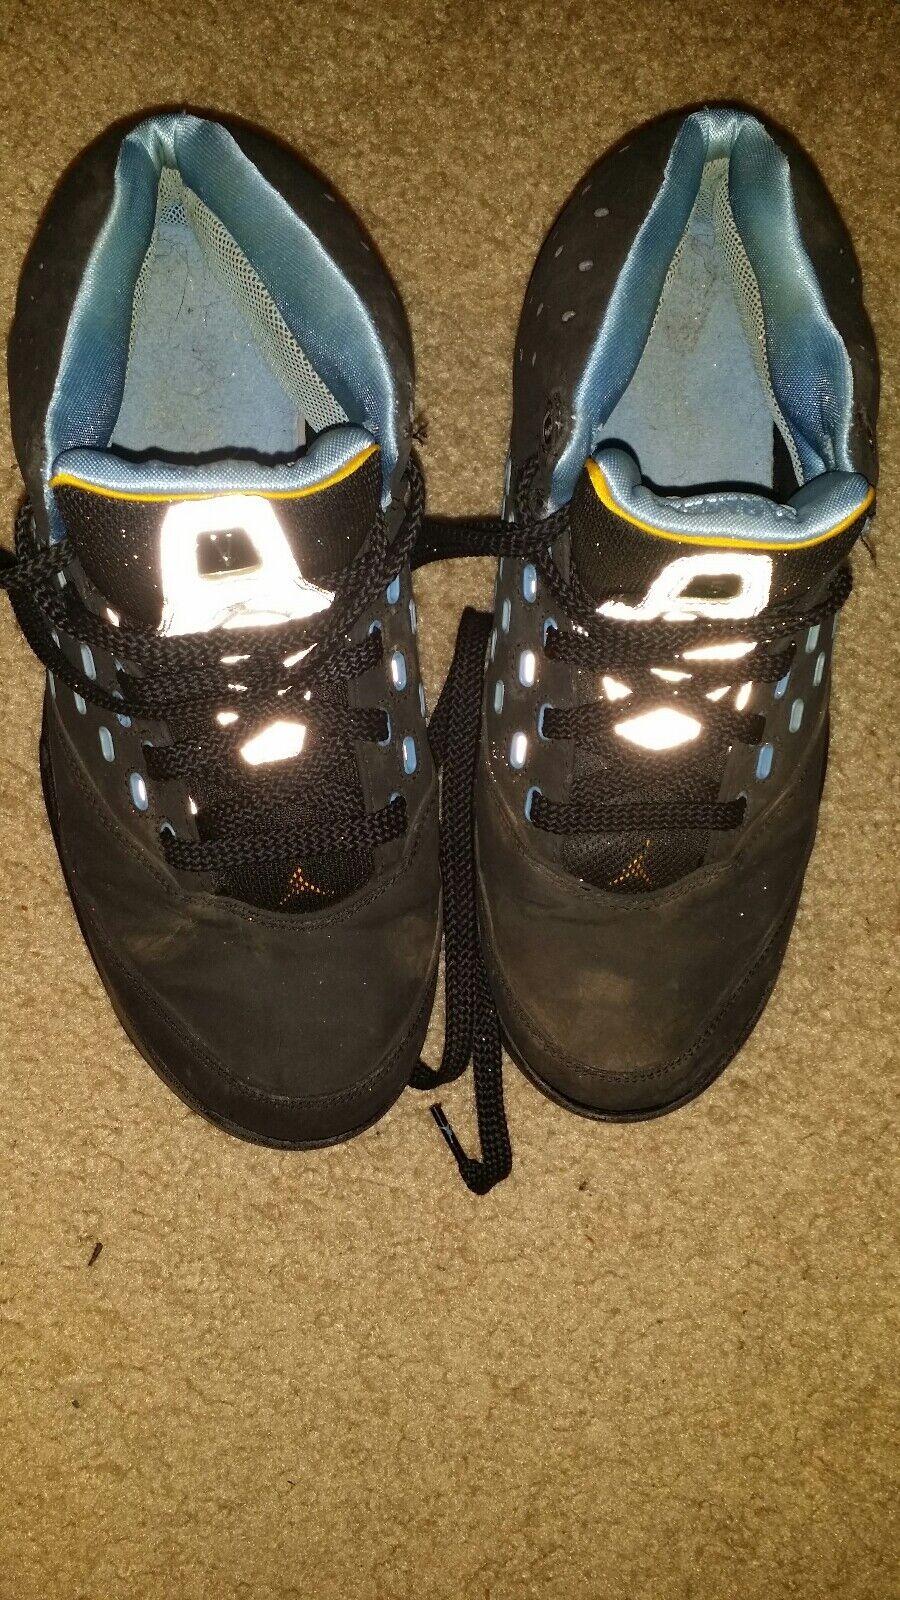 Air Jordan Melo Black Met bluee Silver Size 8 NO BOX 311813-001